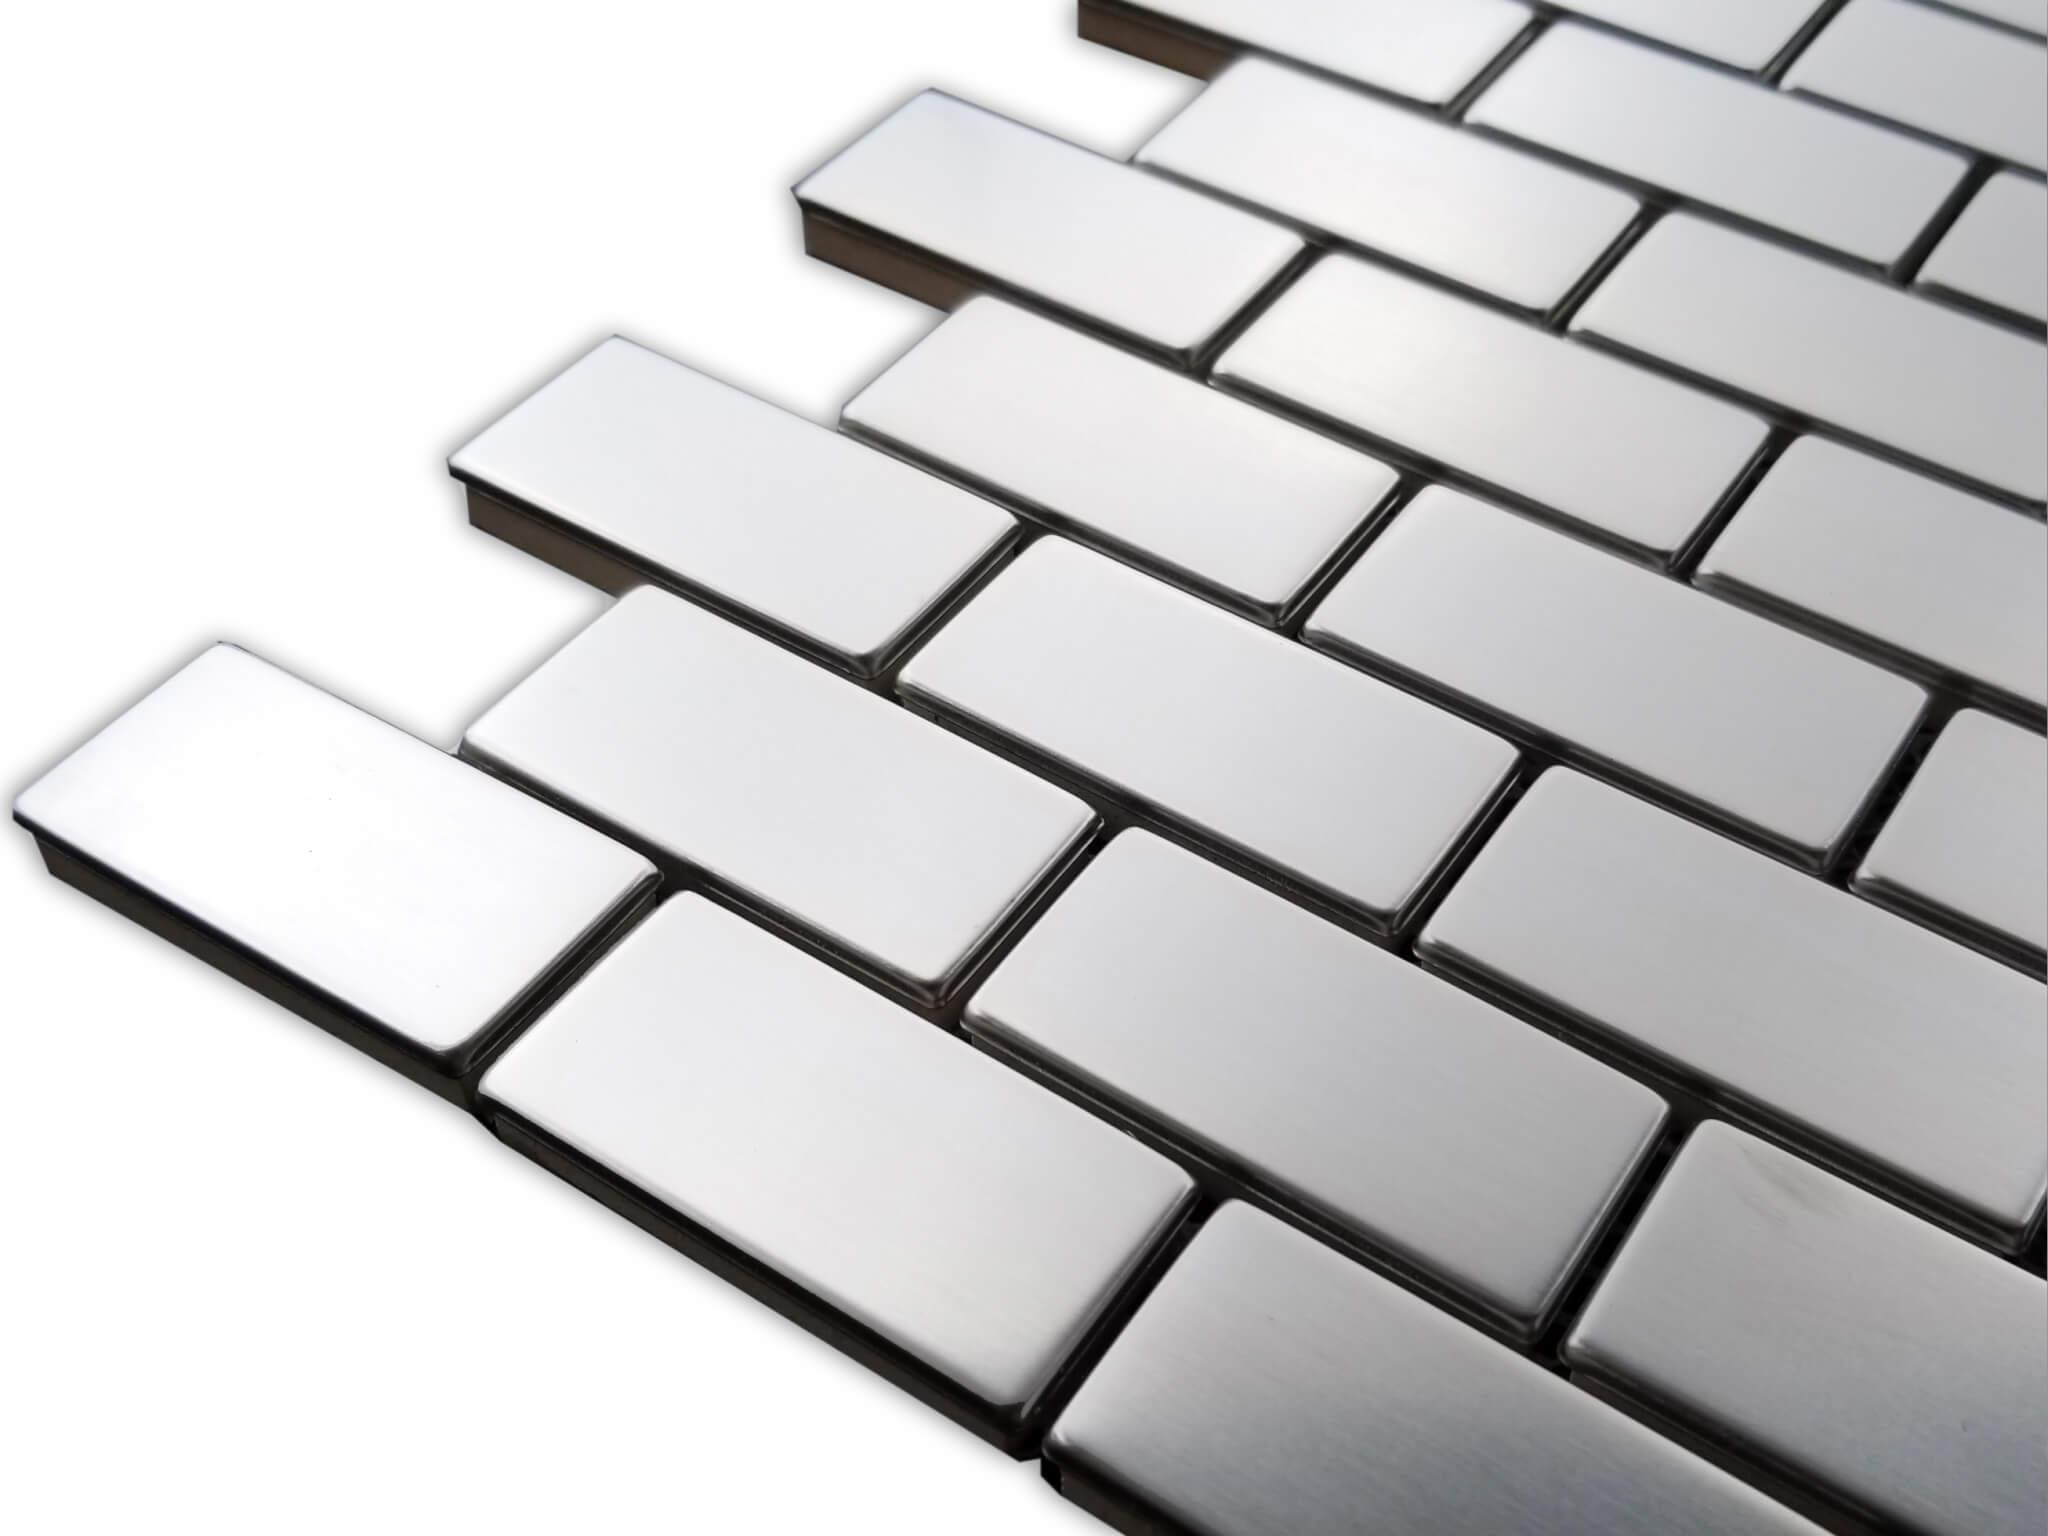 Stainless Steel Tile Hs031 Dixietileshop Mosaic Tiles